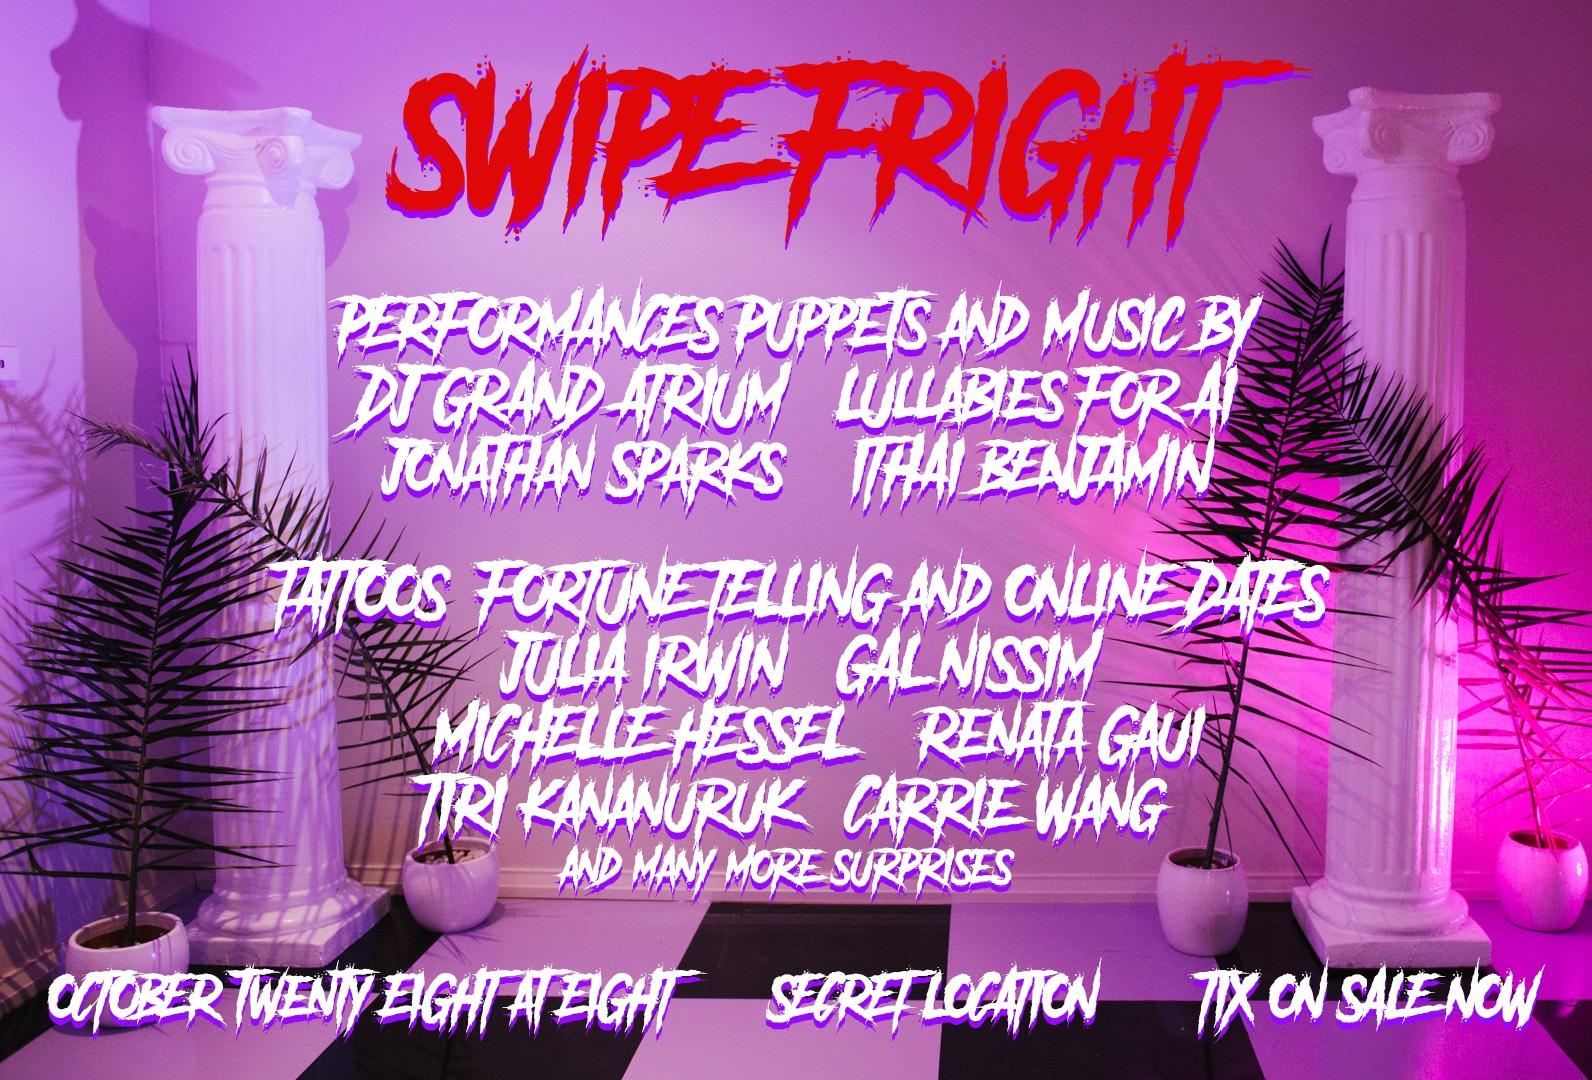 swipefright!